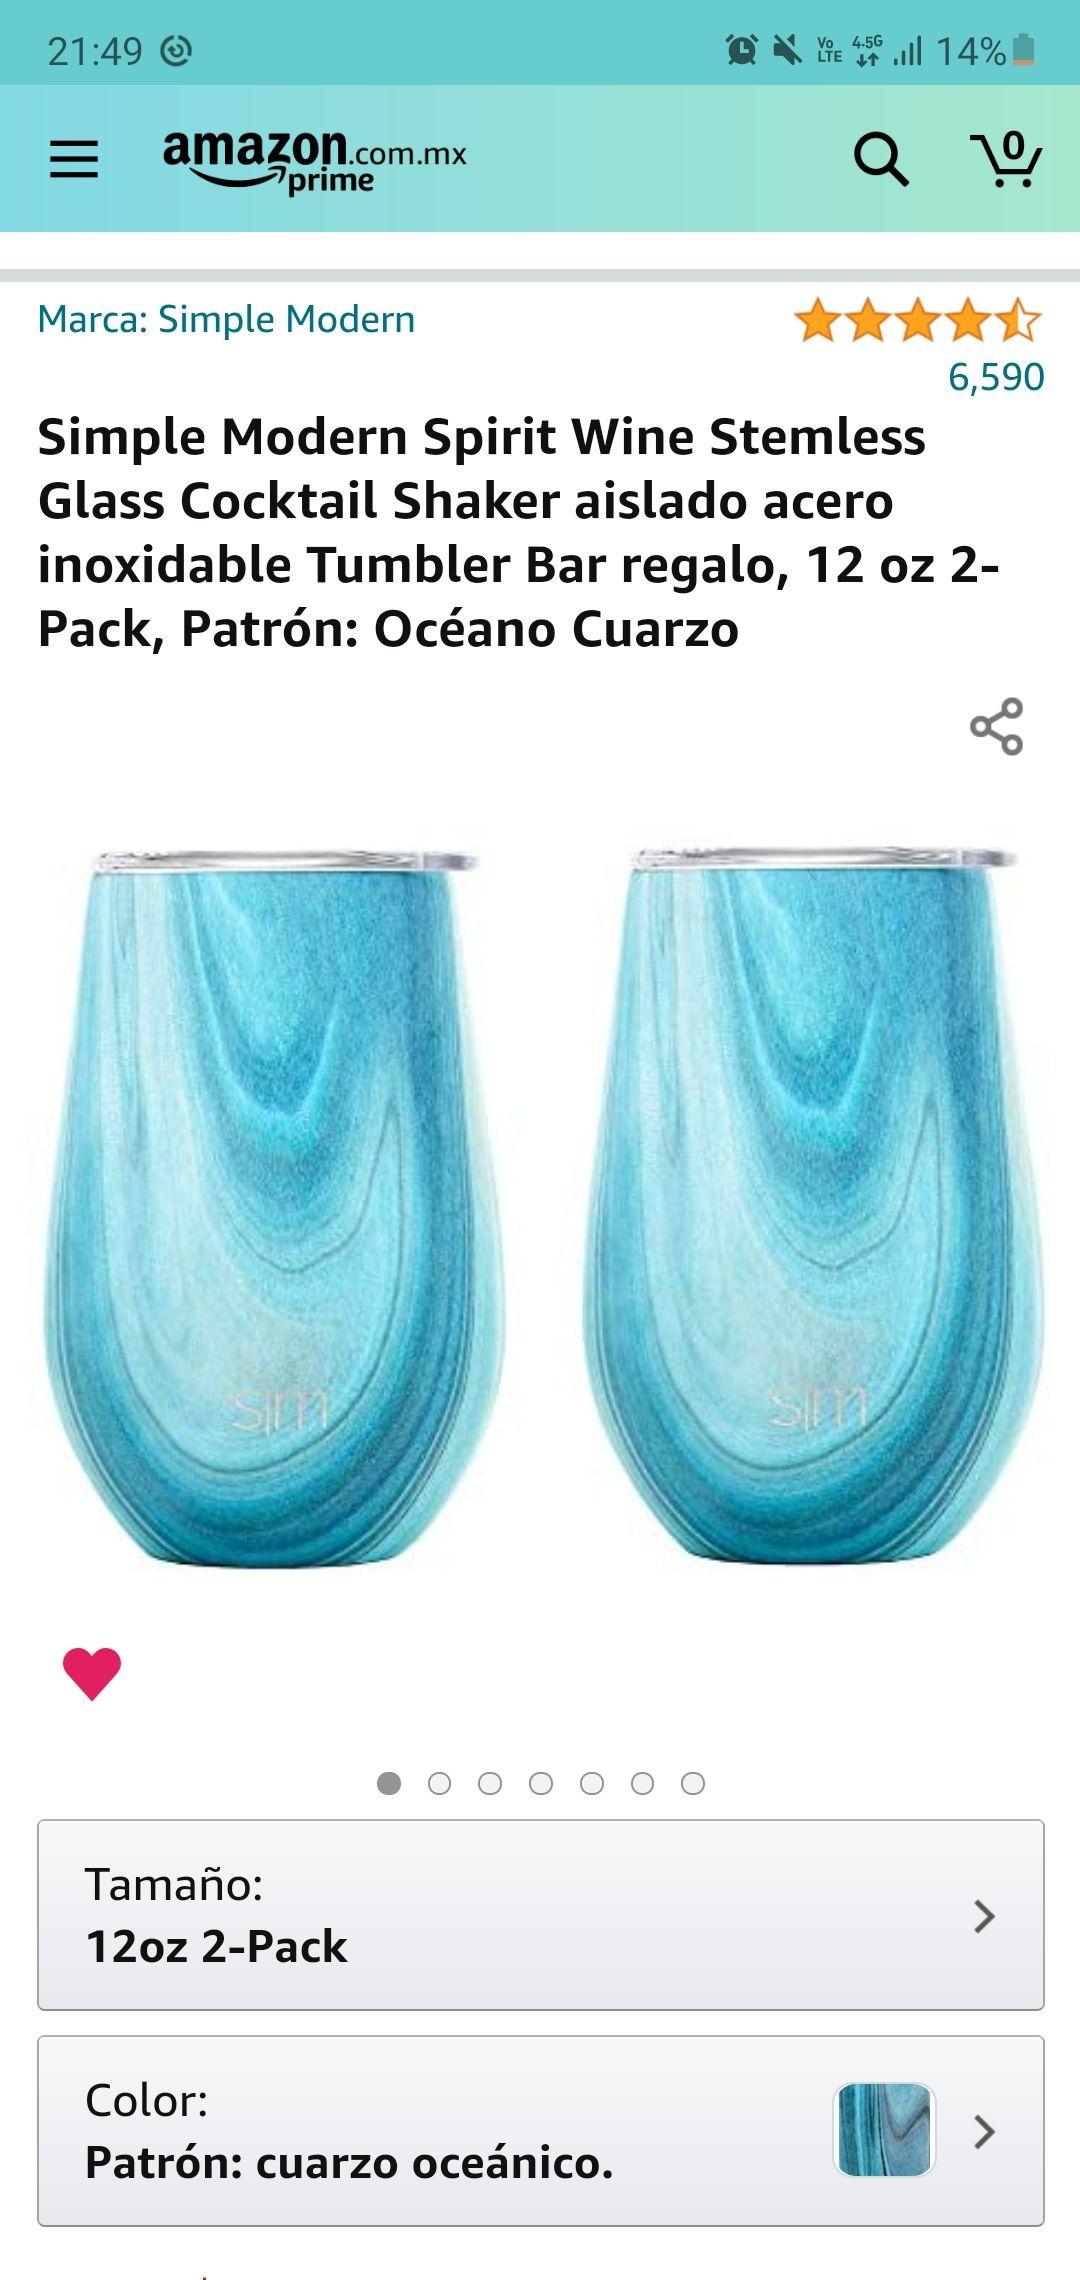 Amazon: Vasos aislados de acero inoxidable Tumbler Bar regalo, 12 oz 2-Pack